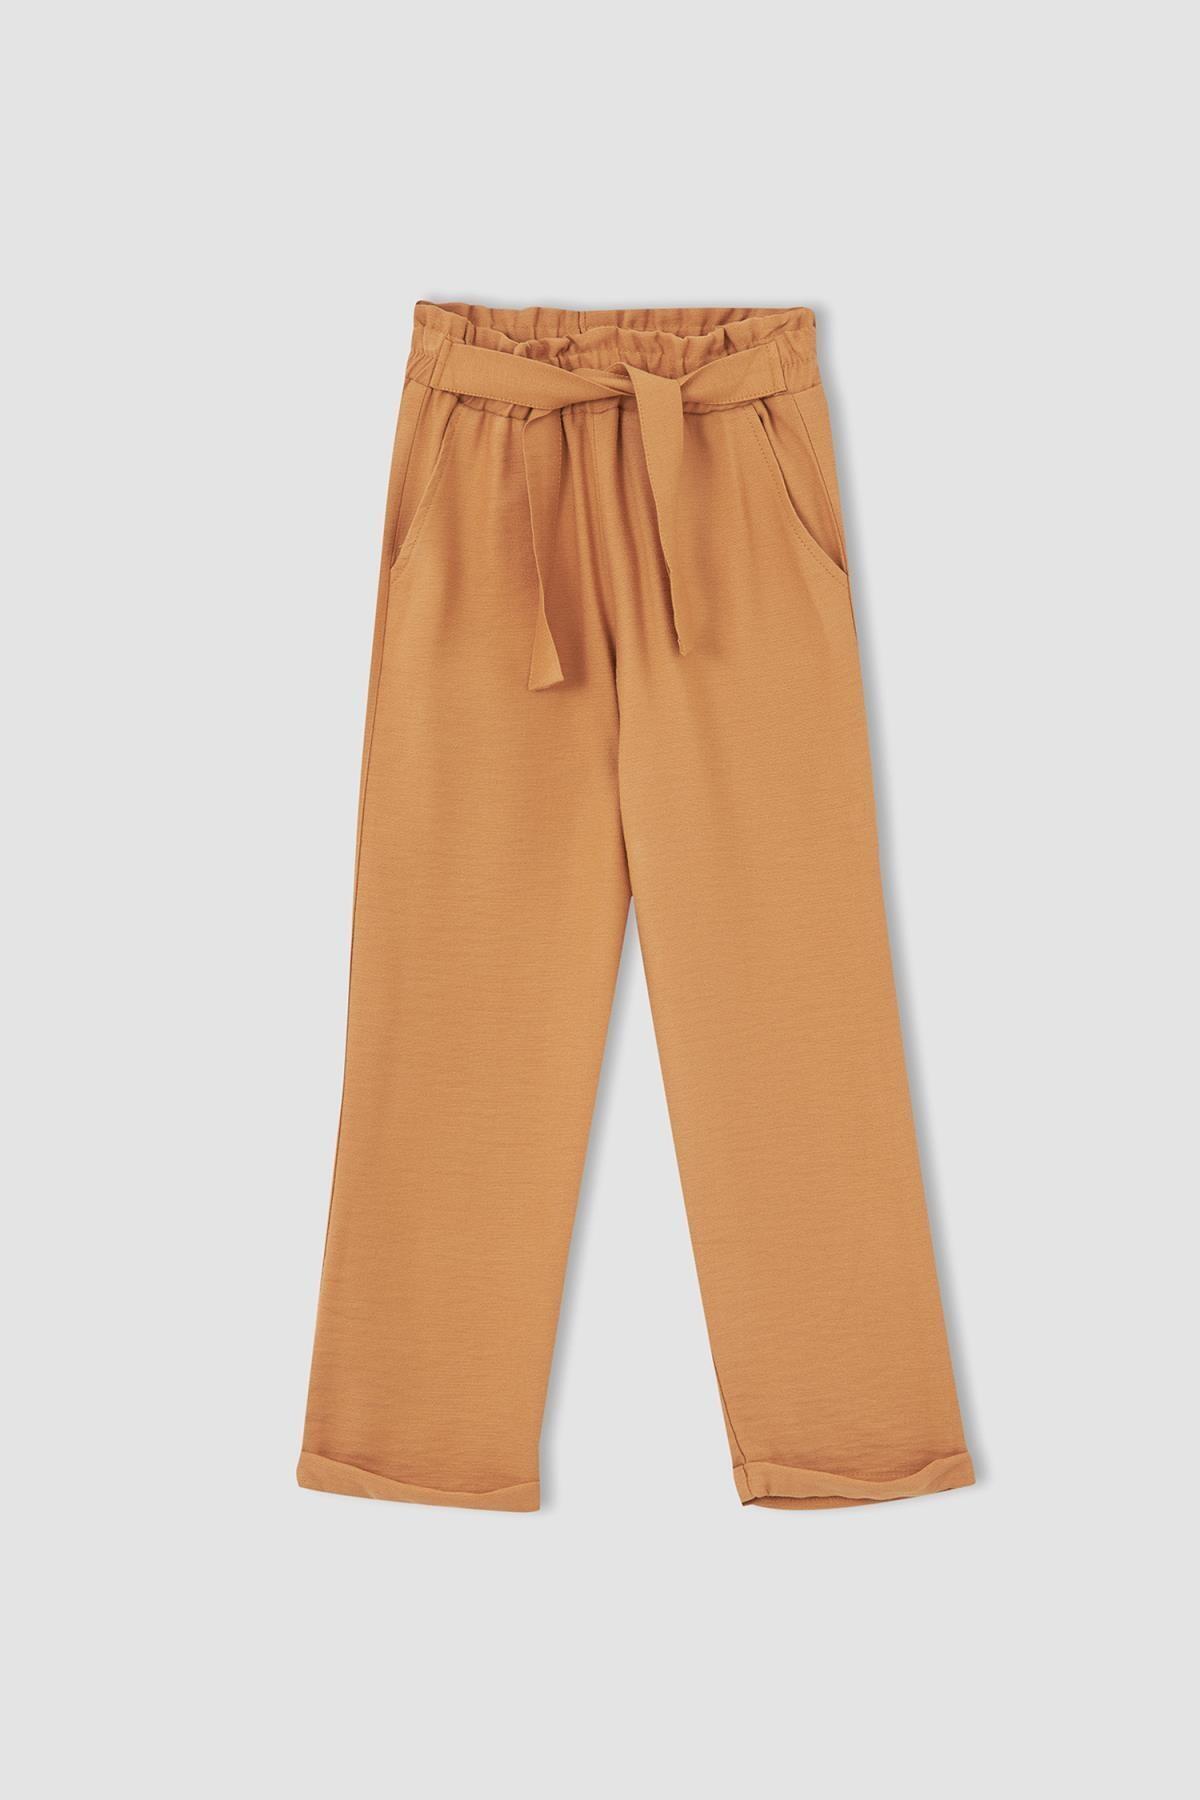 Kız Çocuk Carrot Fit Dokuma Pantolon T3873A621SPB